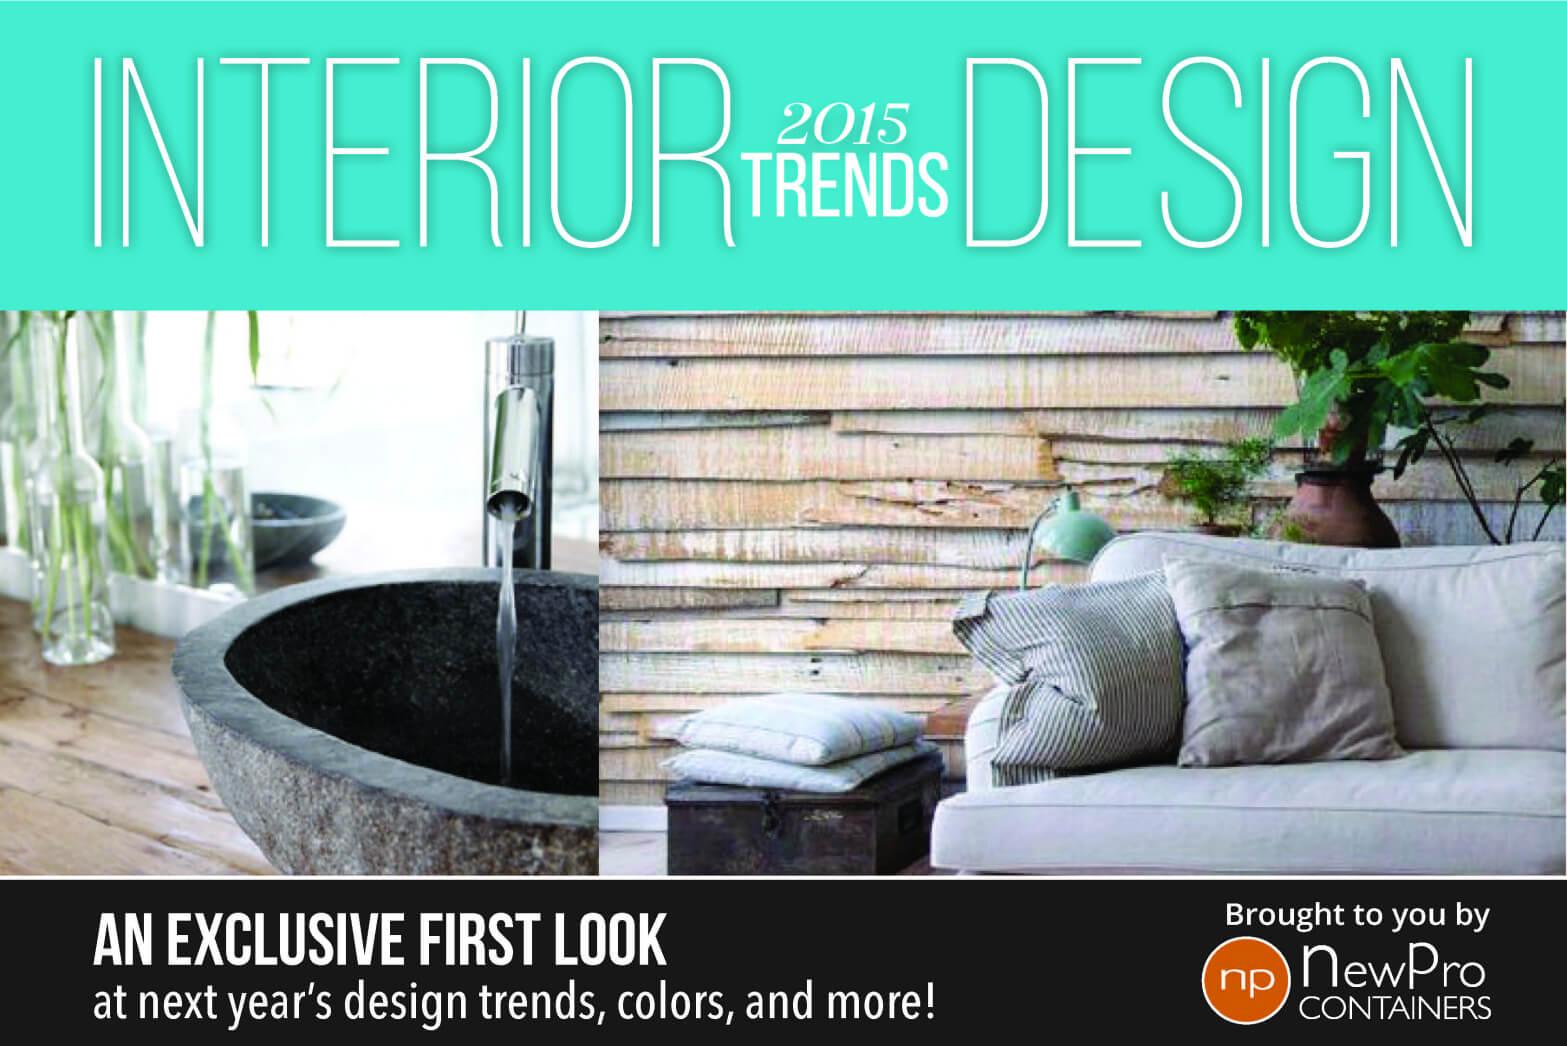 Dazzling mid century condo by modern design Home stratosphere s interior design software free